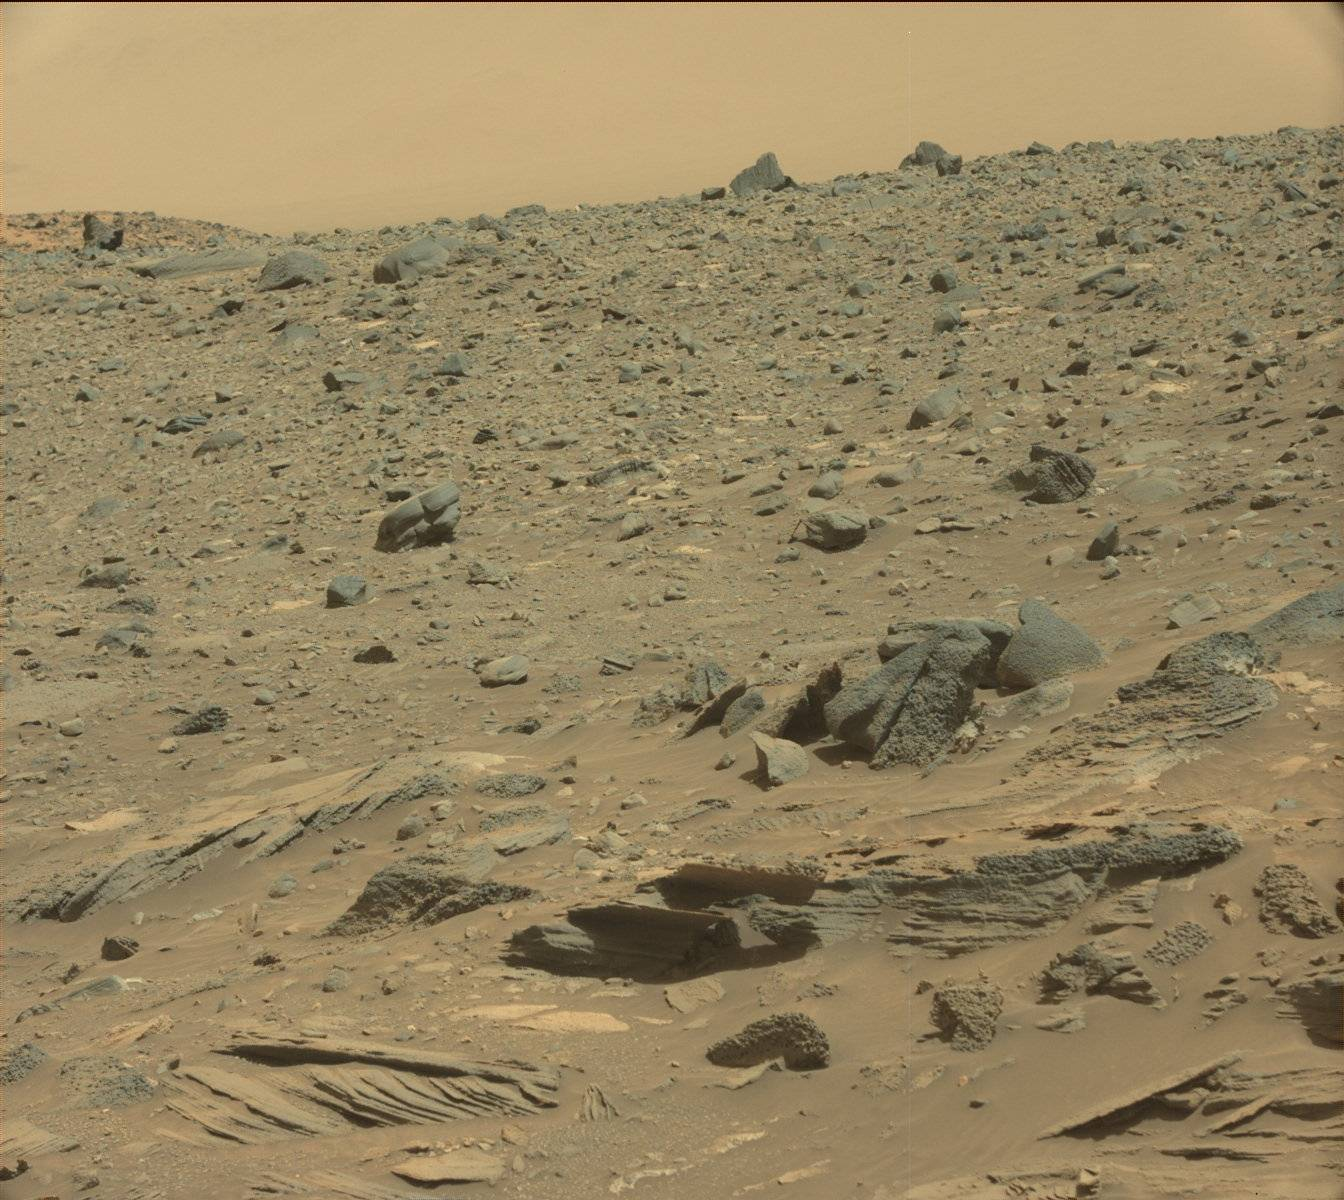 nasa life on mars rumor - photo #38